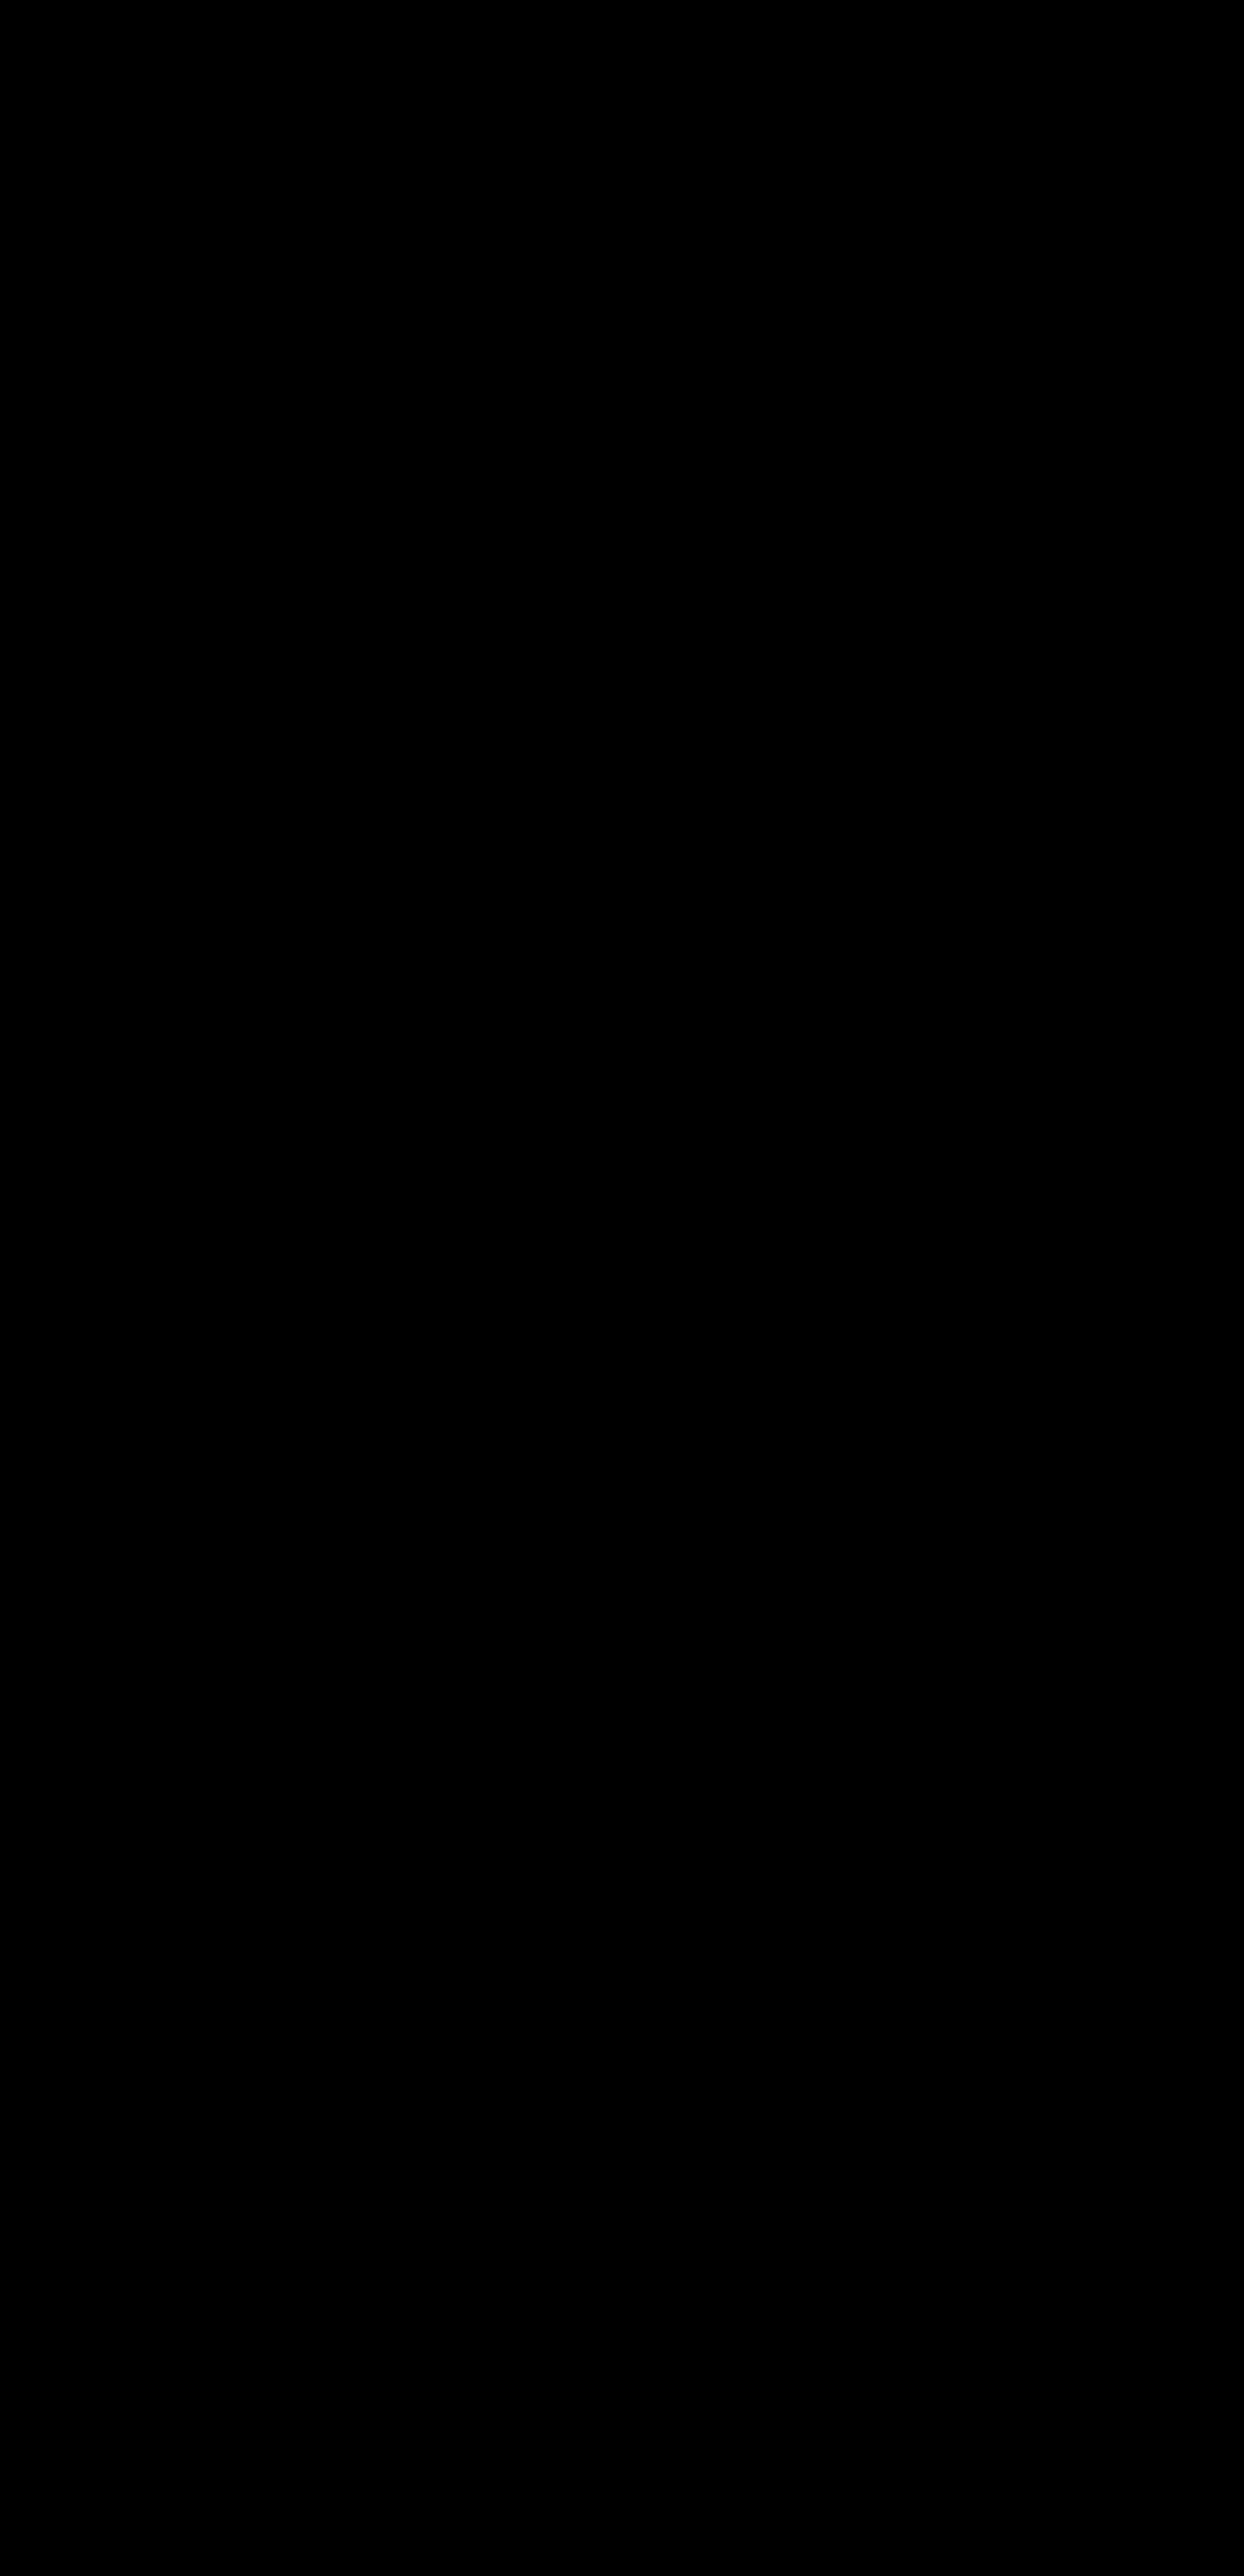 File bw wikimedia commons. Gymnastics clipart svg